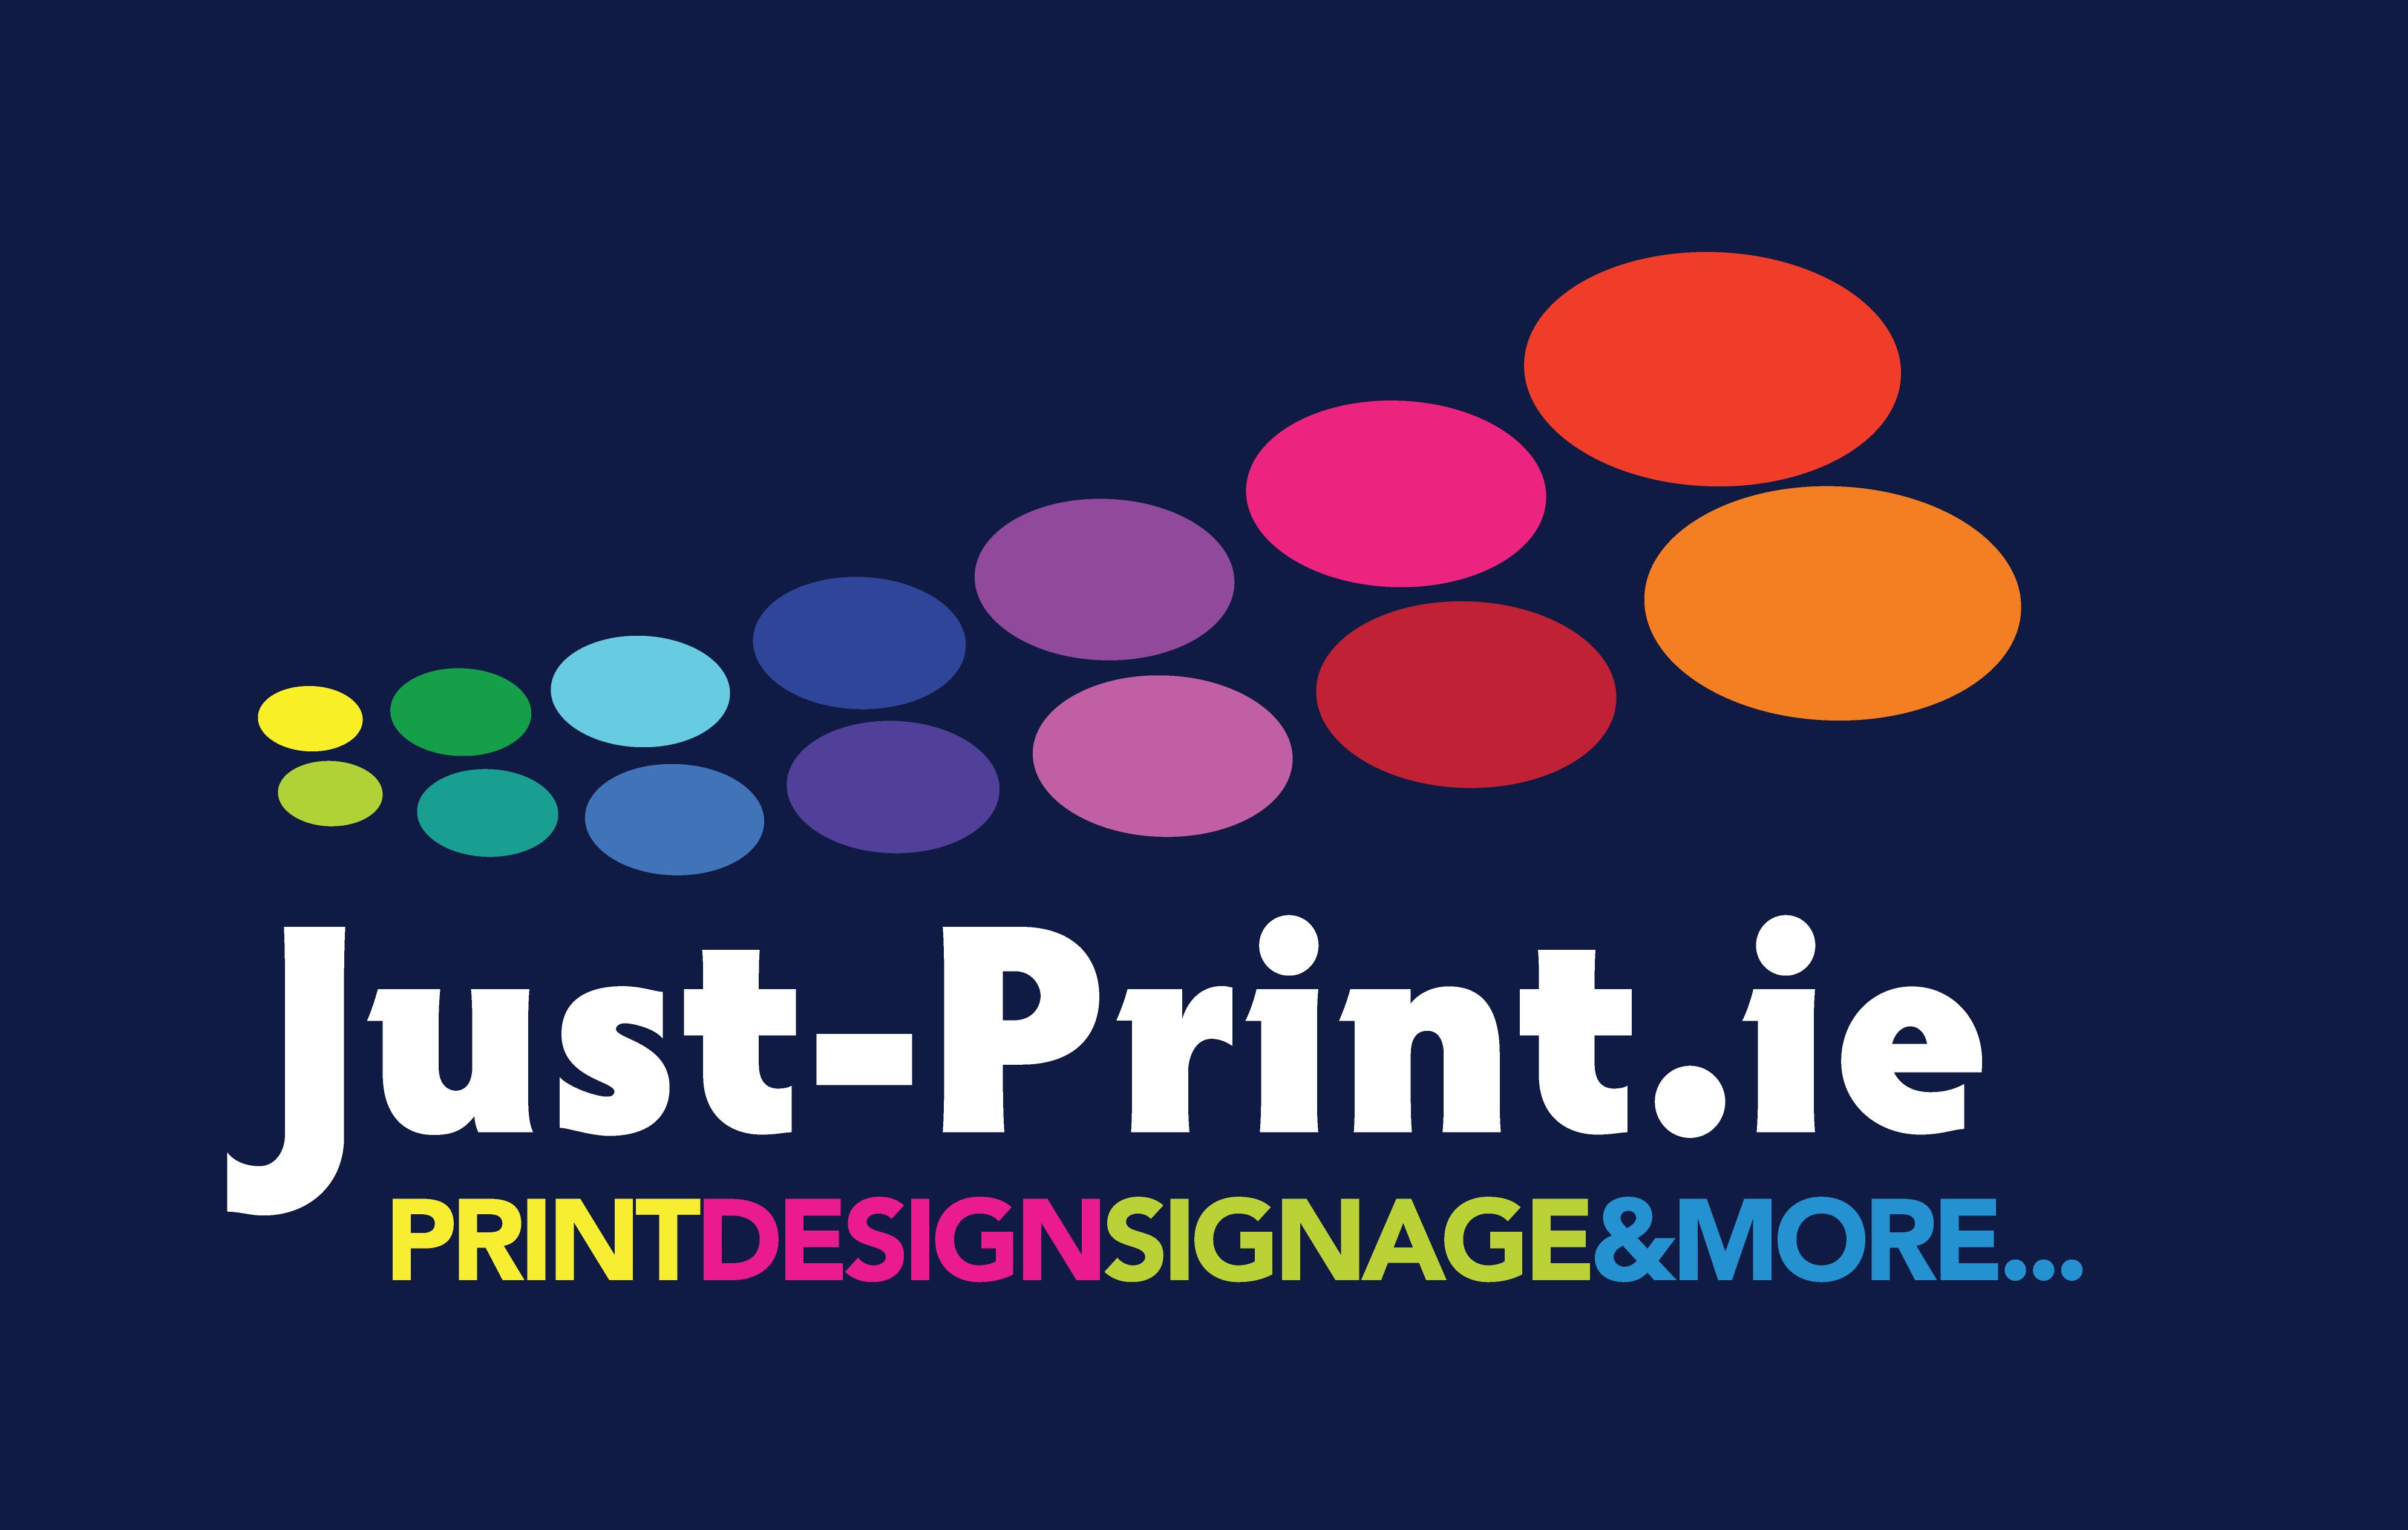 Just-Print logo